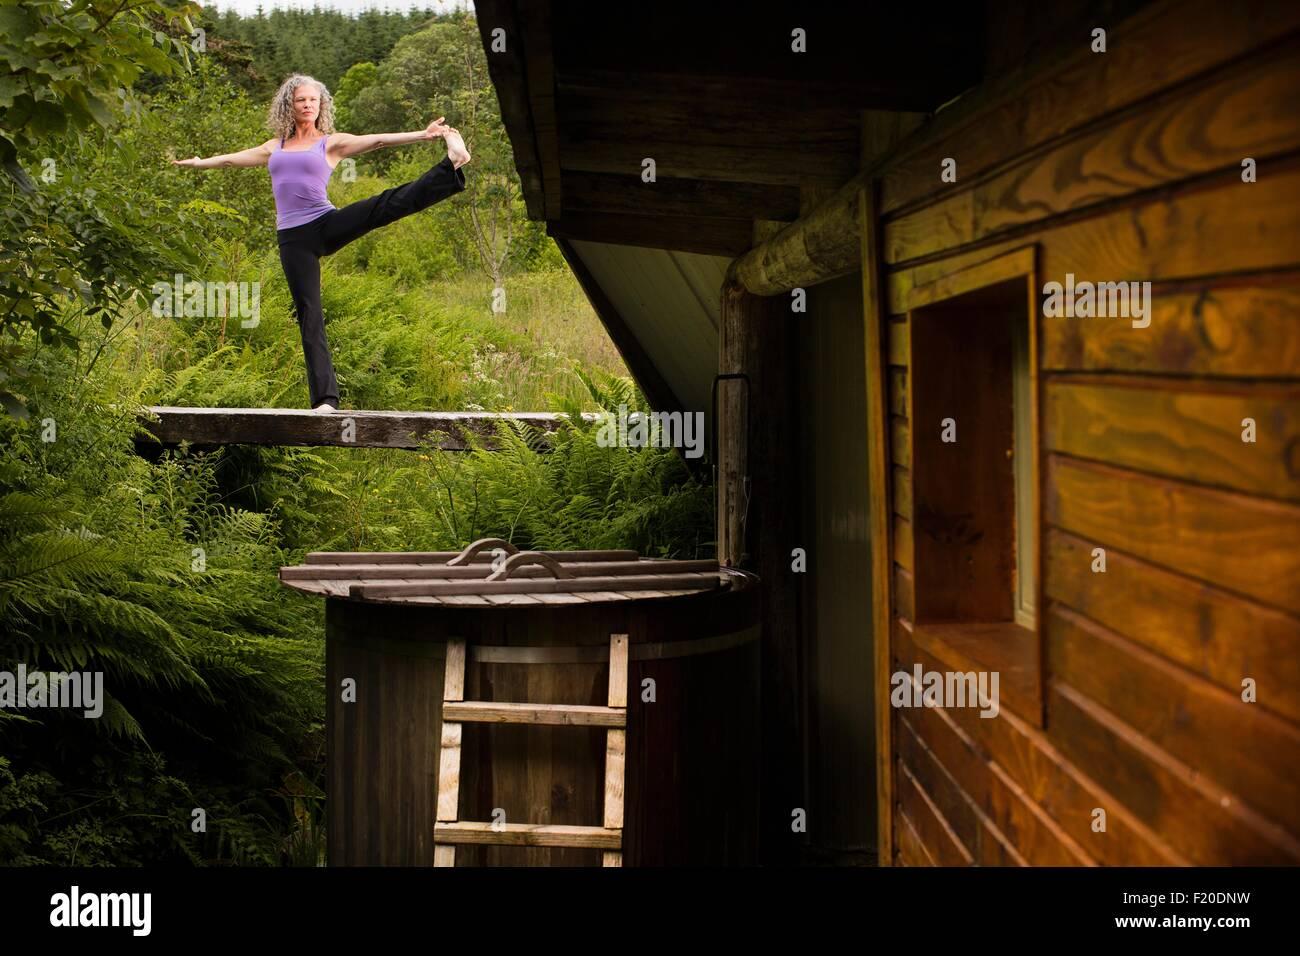 Reife Frau praktizieren Yoga-Pose auf Steg in Eco lodge Stockbild